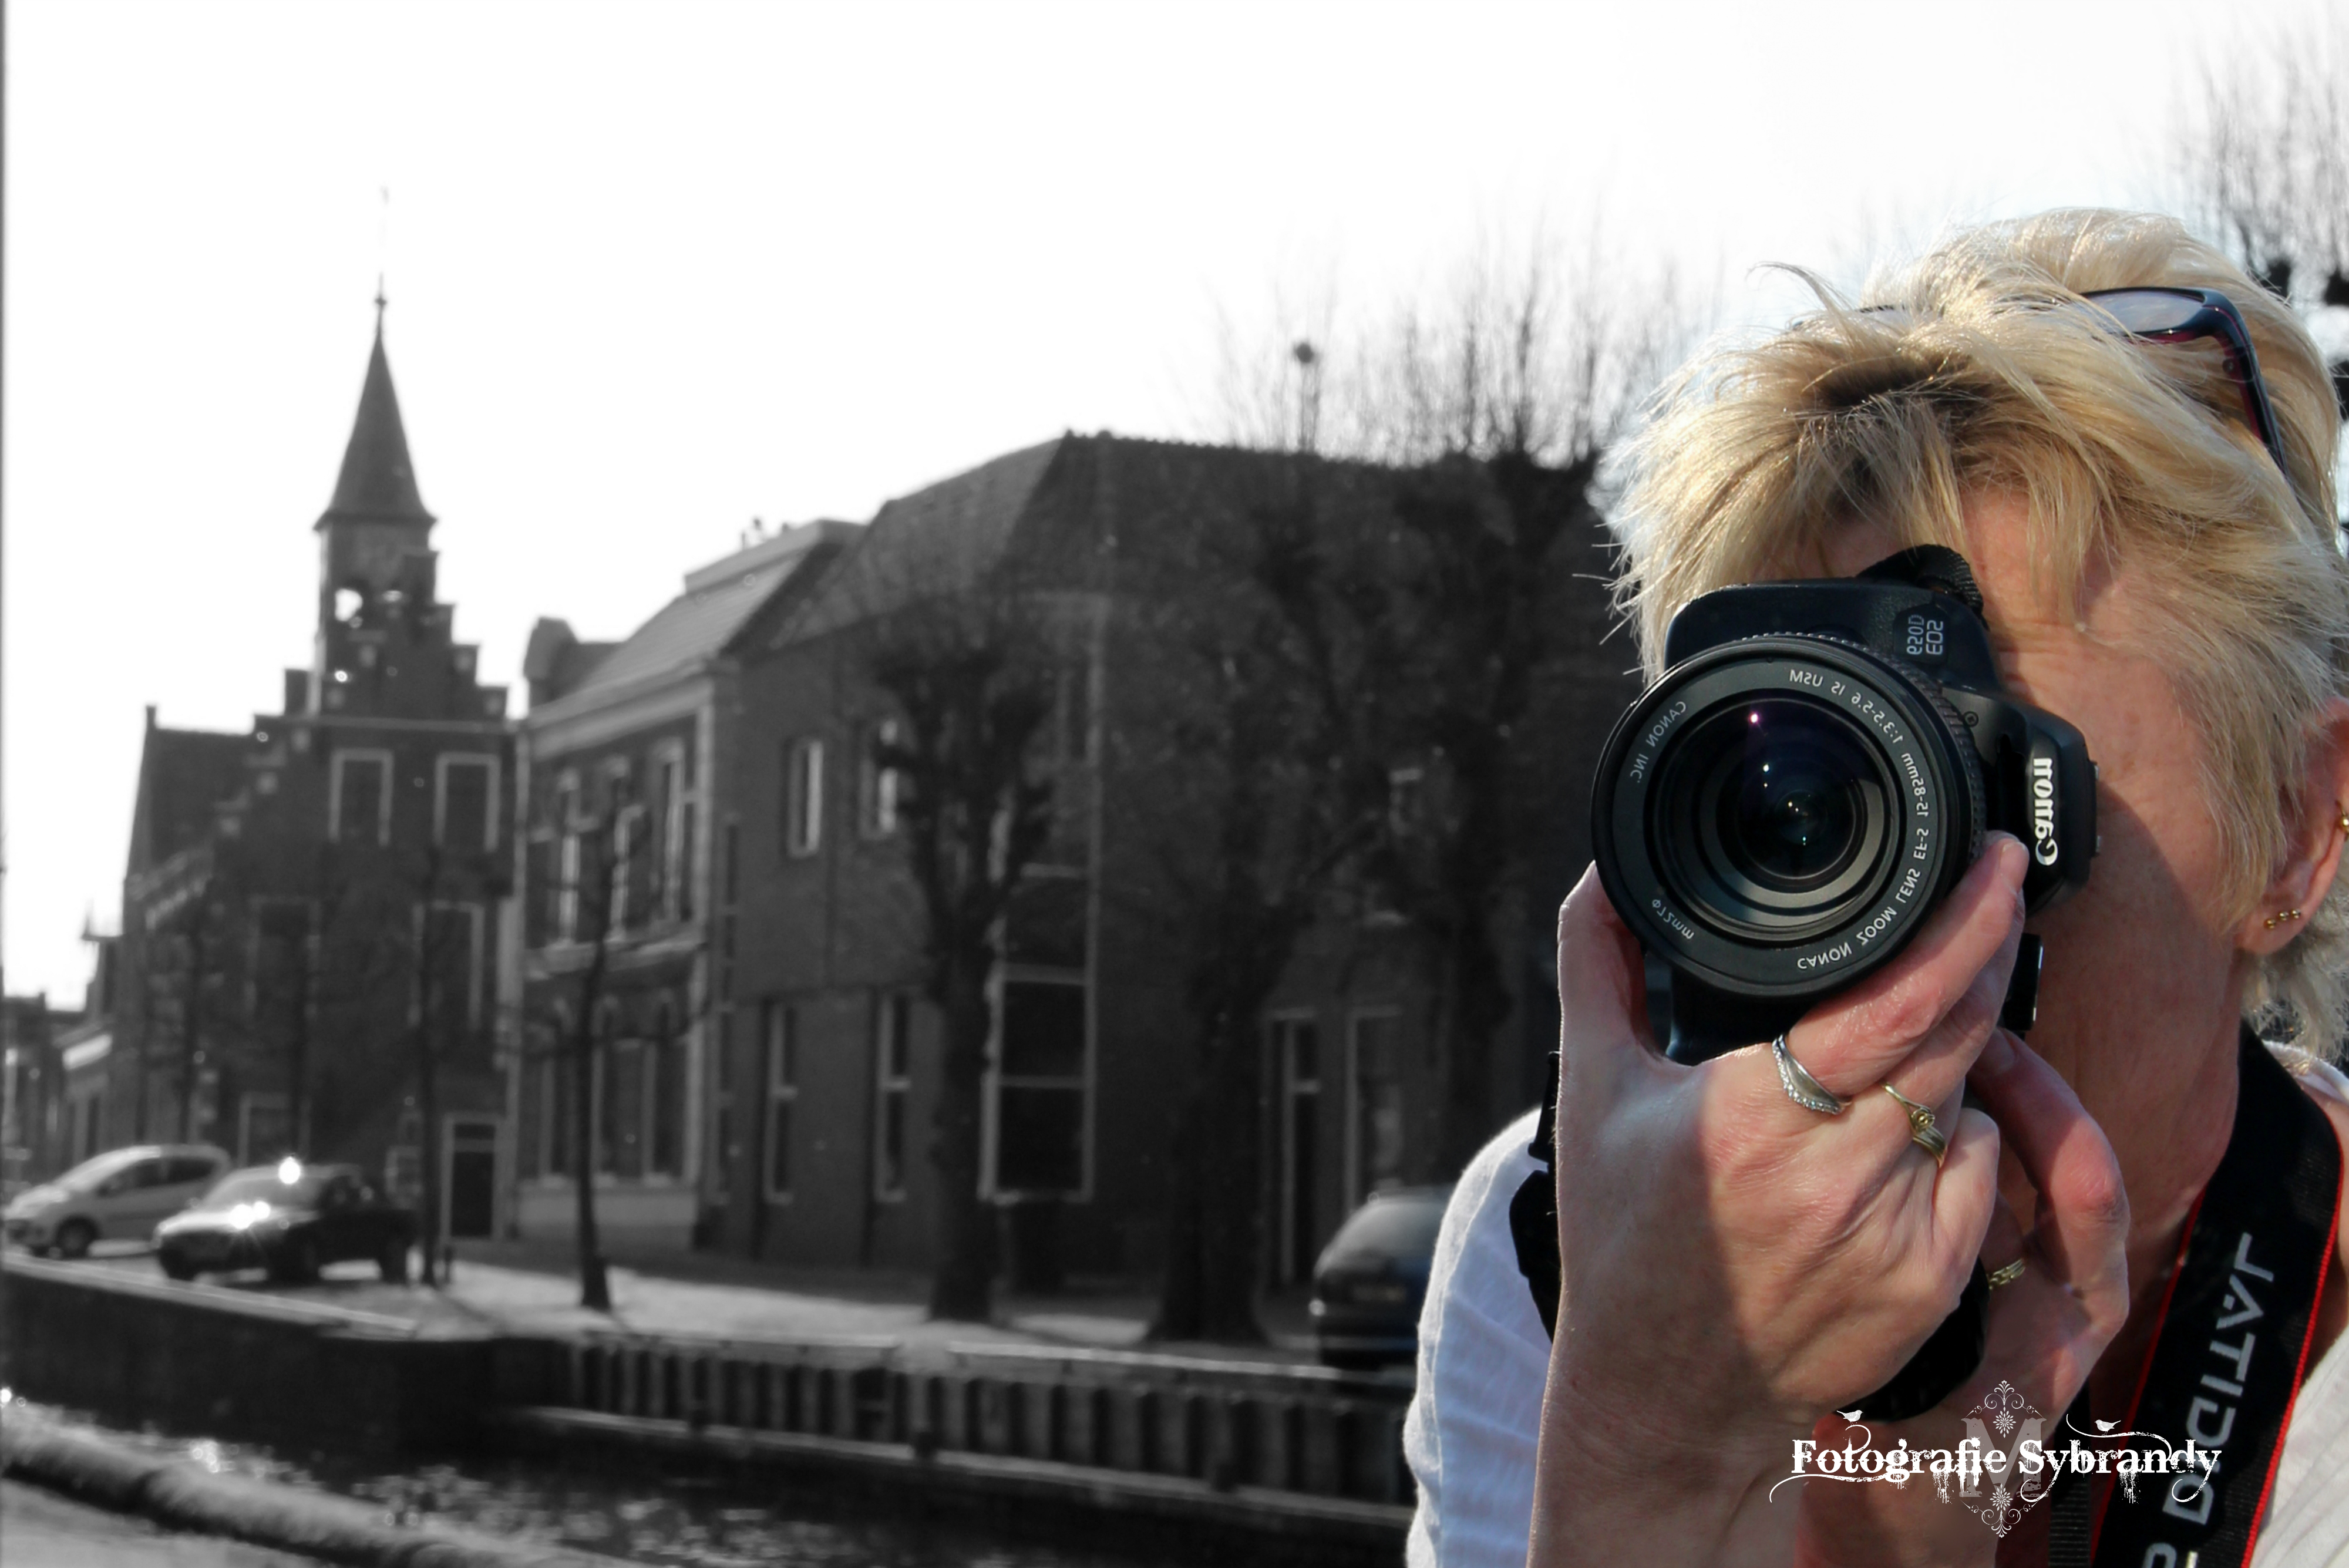 Fotografie Sybrandy Balk